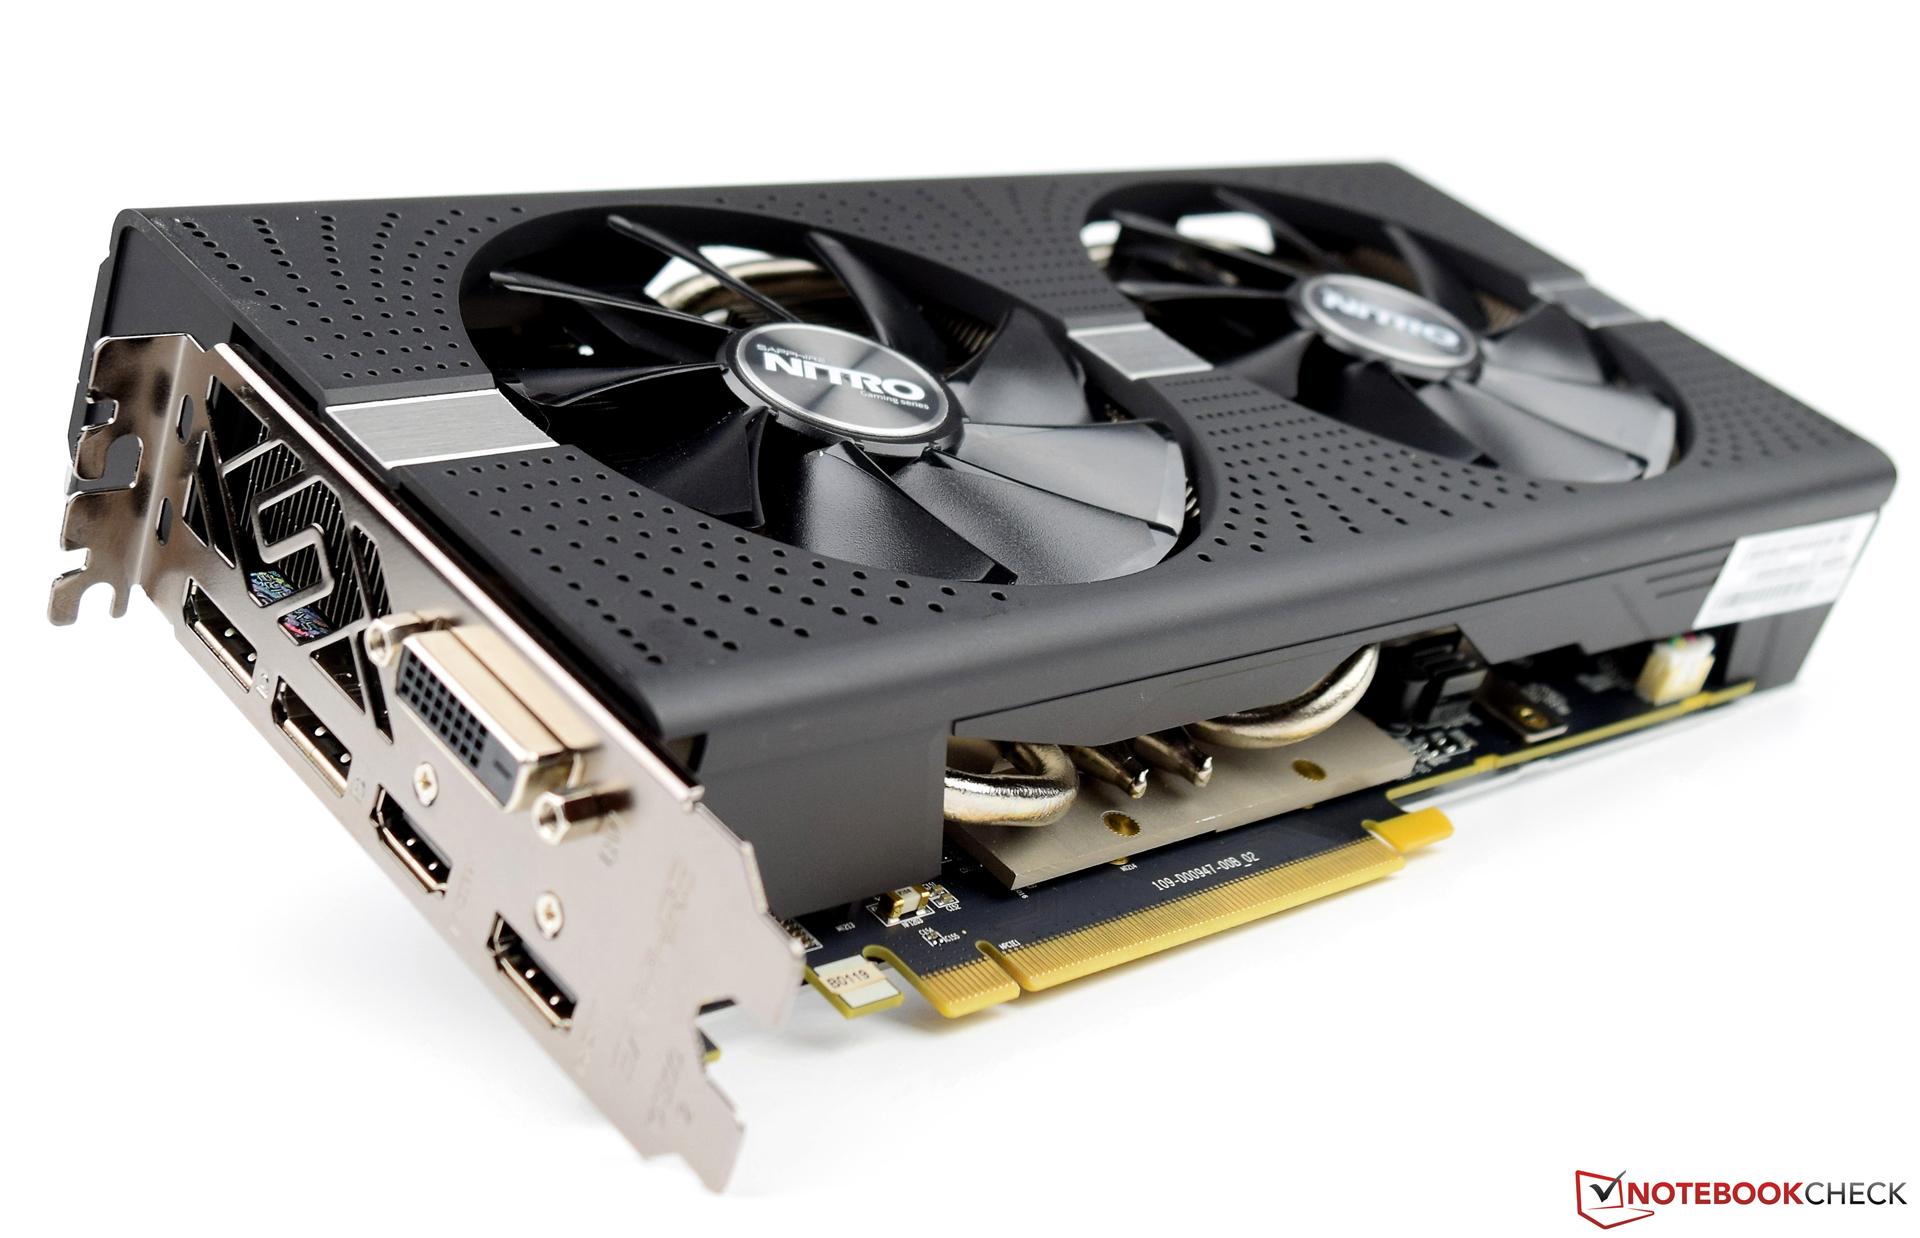 Sapphire Nitro Radeon Rx 580 Desktop Graphics Card Review Notebookcheck Net Reviews